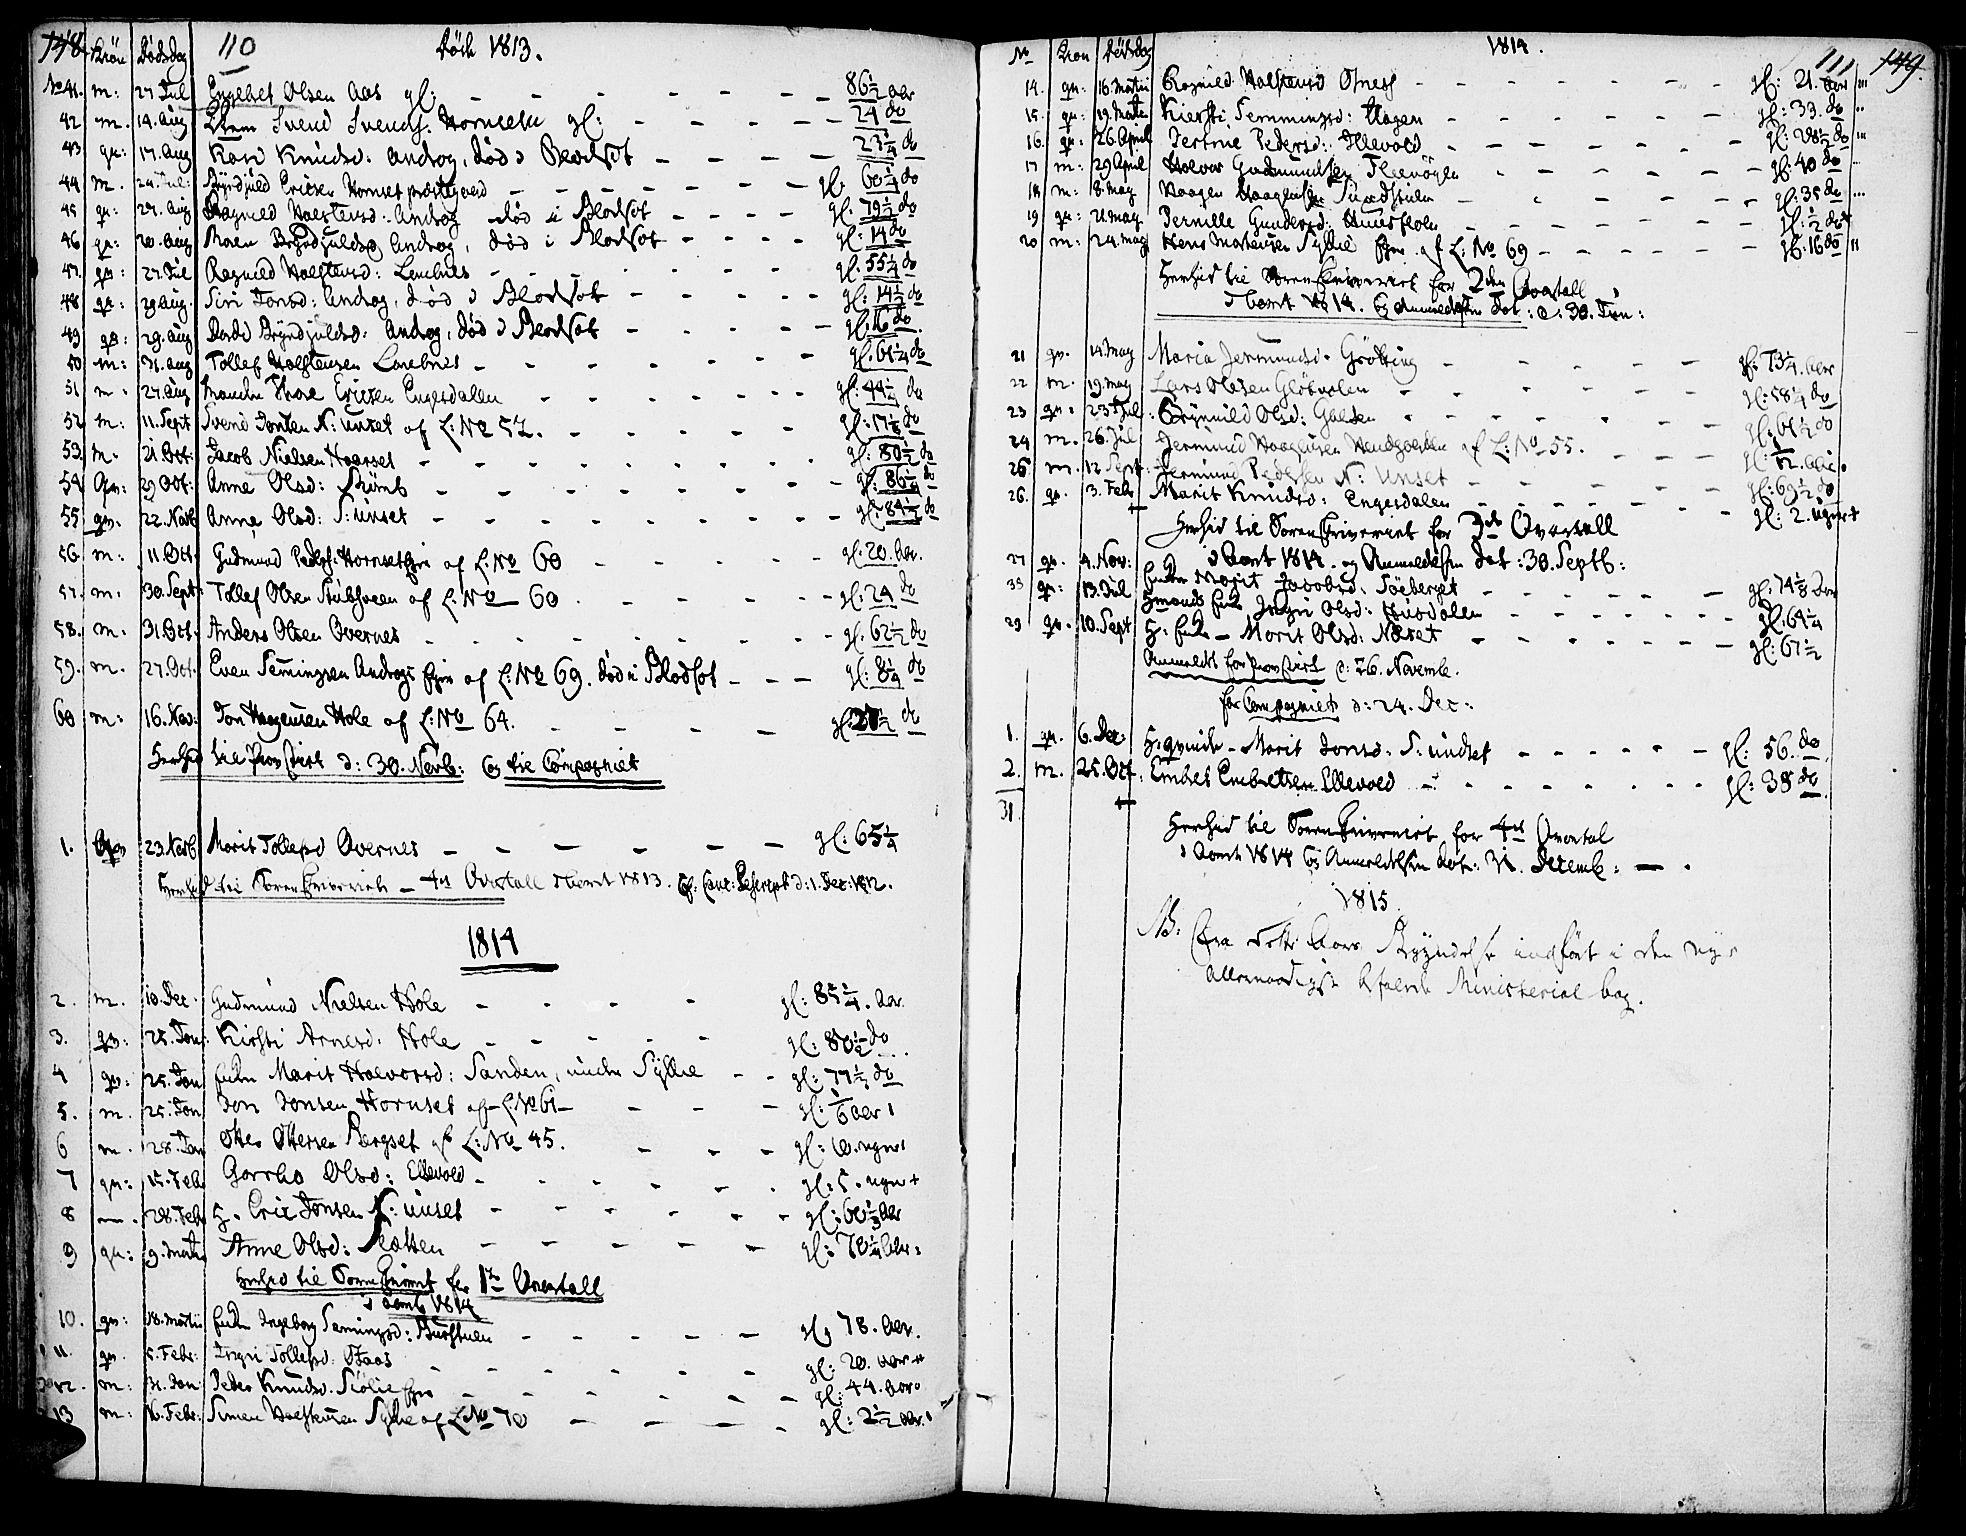 SAH, Rendalen prestekontor, H/Ha/Haa/L0002: Parish register (official) no. 2, 1788-1814, p. 110-111